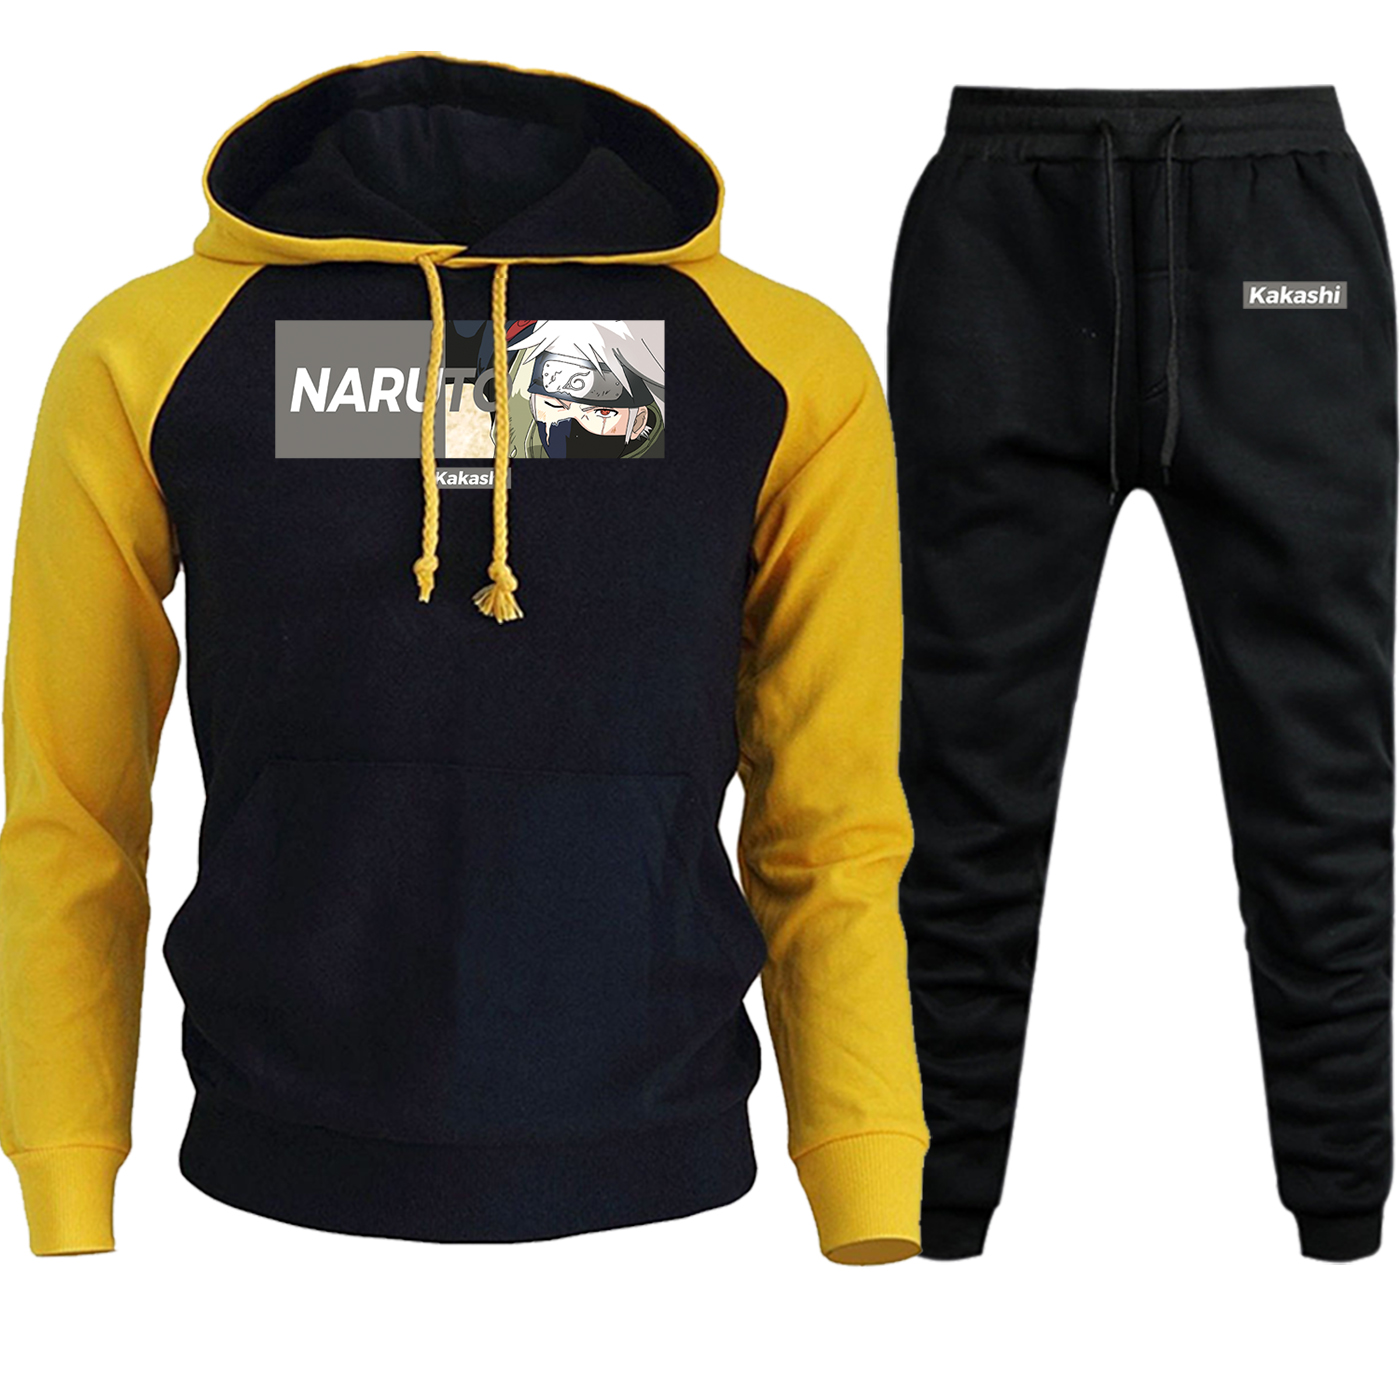 Naruto Kakashi Cartoon Printed Hoodies Men Ragan 2019 Autumn Winter Streetwear+Pants Sets Anime Harajuku Fleece Suit Male Hooded